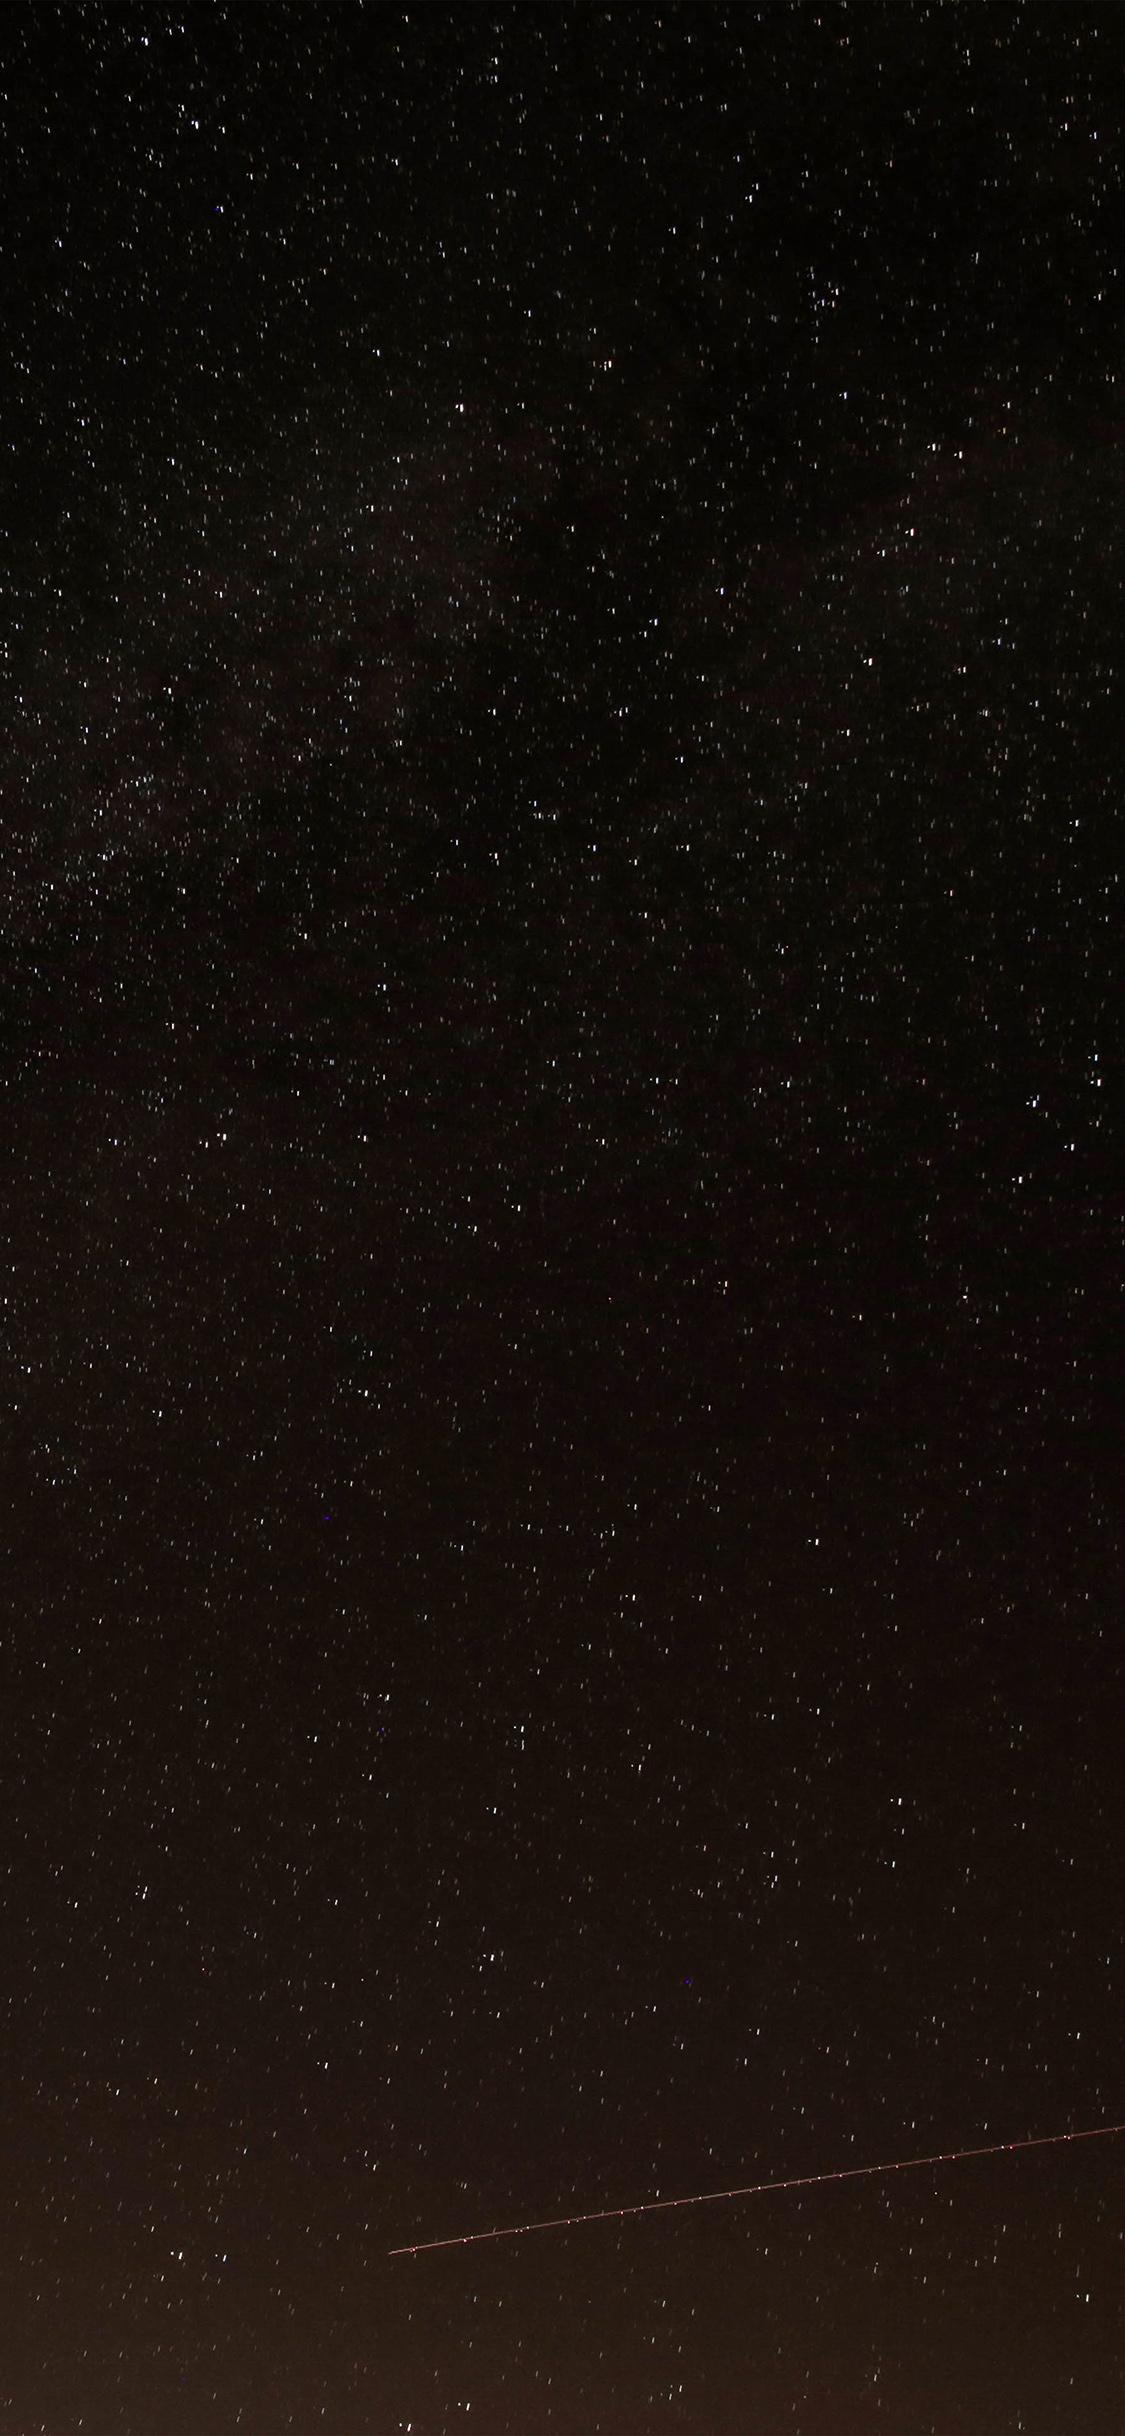 Iphonexpapers Com Iphone X Wallpaper Nq22 Night Sky Dark Star Nature